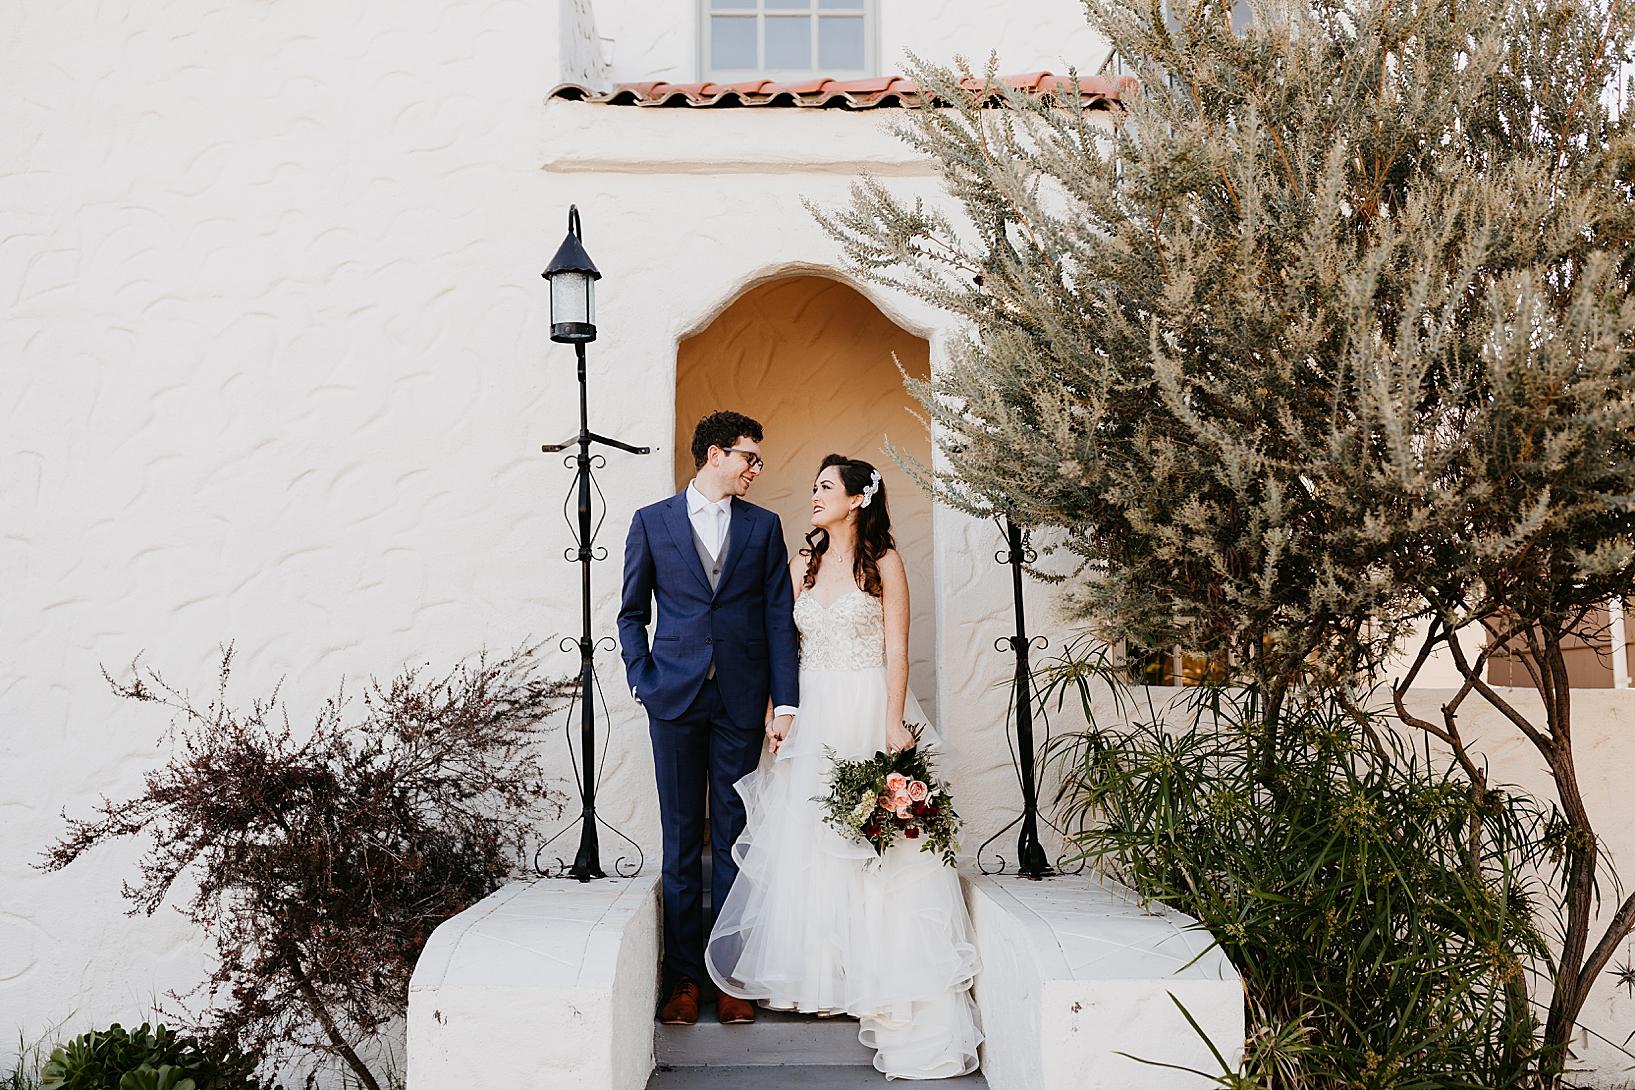 Brick-San-Diego-Winter-Wedding-24.jpg